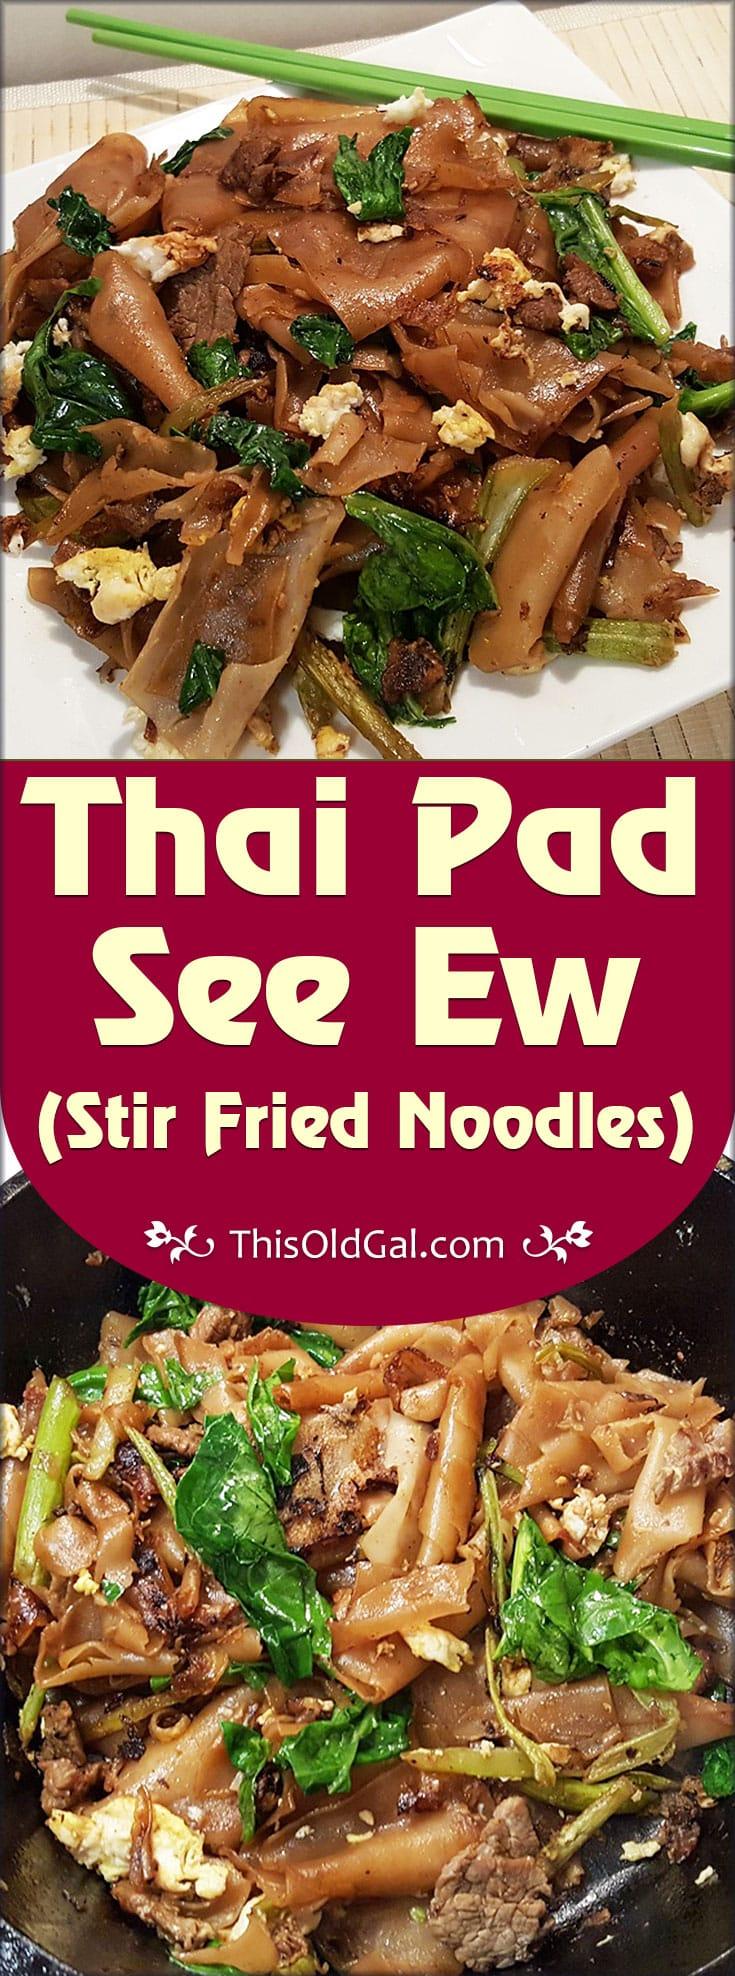 Thai Pad See Ew (Stir Fried Noodles)